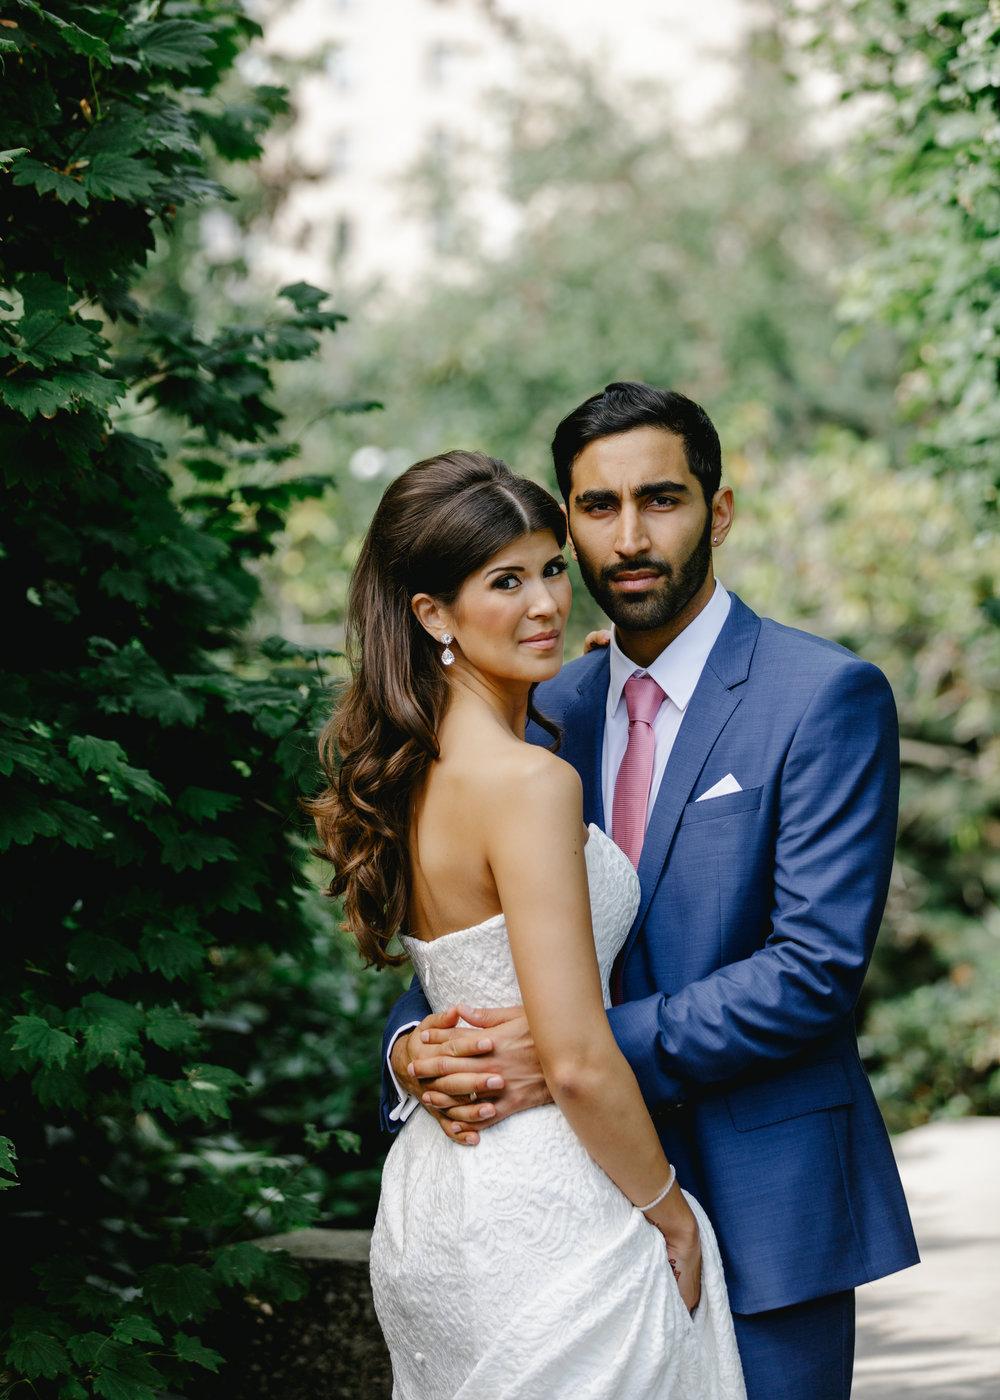 herafilms_nicole_ryan_wedding_preview_day4-14.jpg